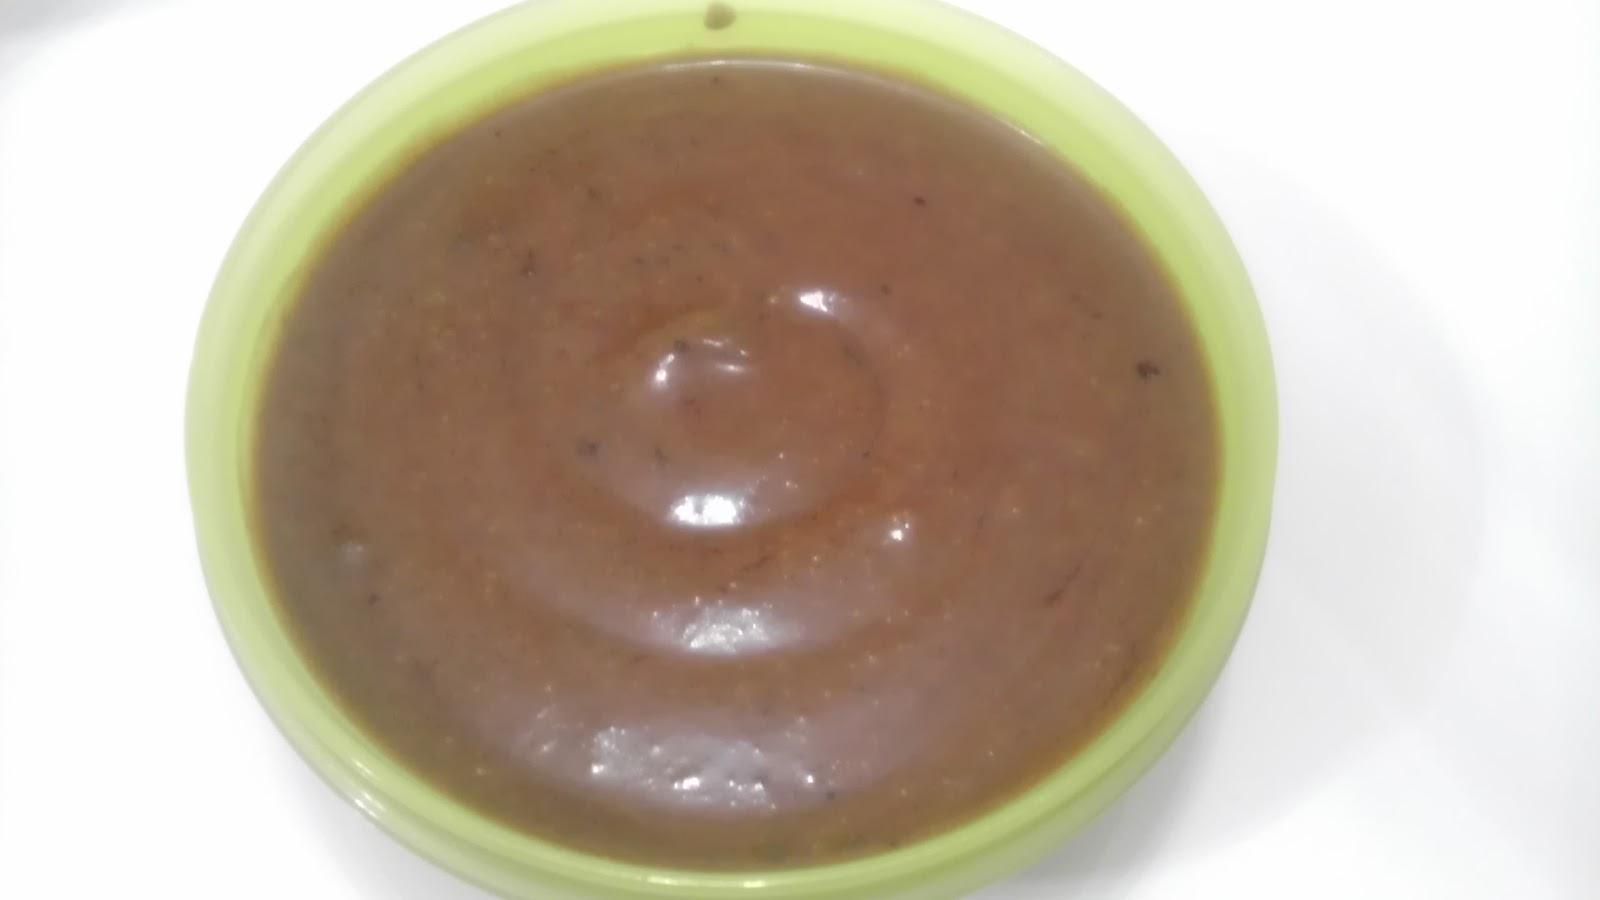 Dukan Diyet Çokokrem Tarifi (Diyet Çikolata Tarifi)